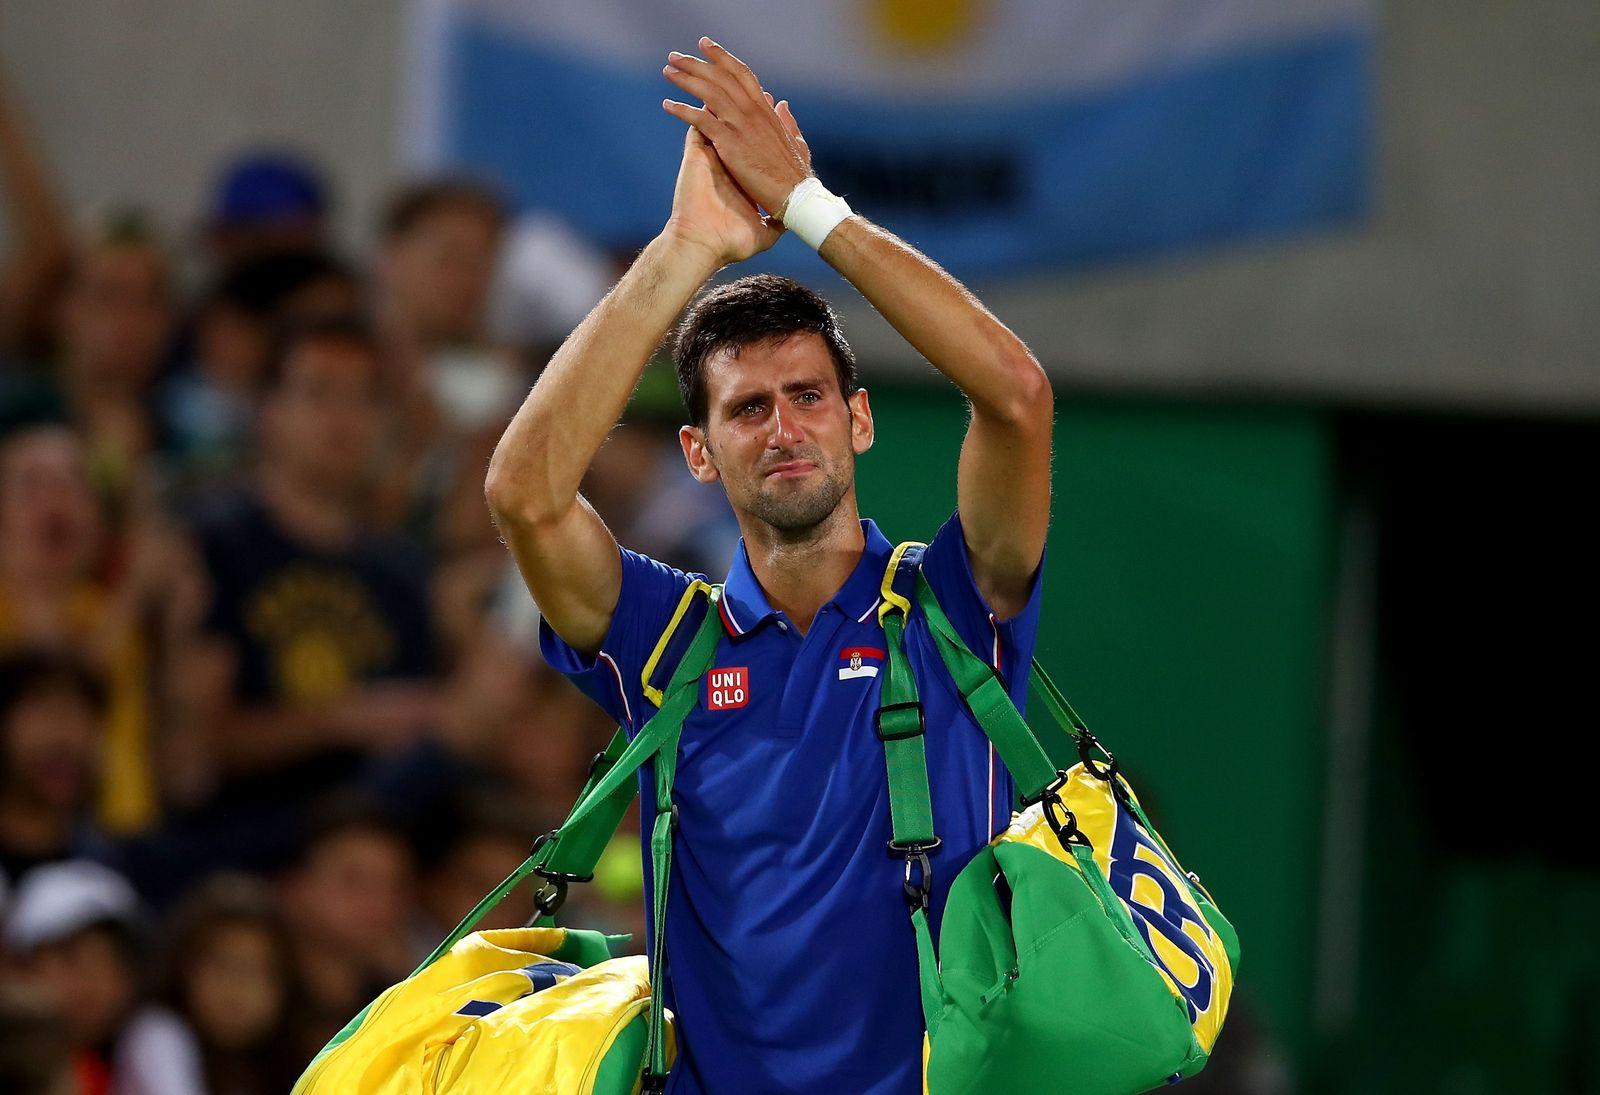 Novak Djokovic / Rio 2016